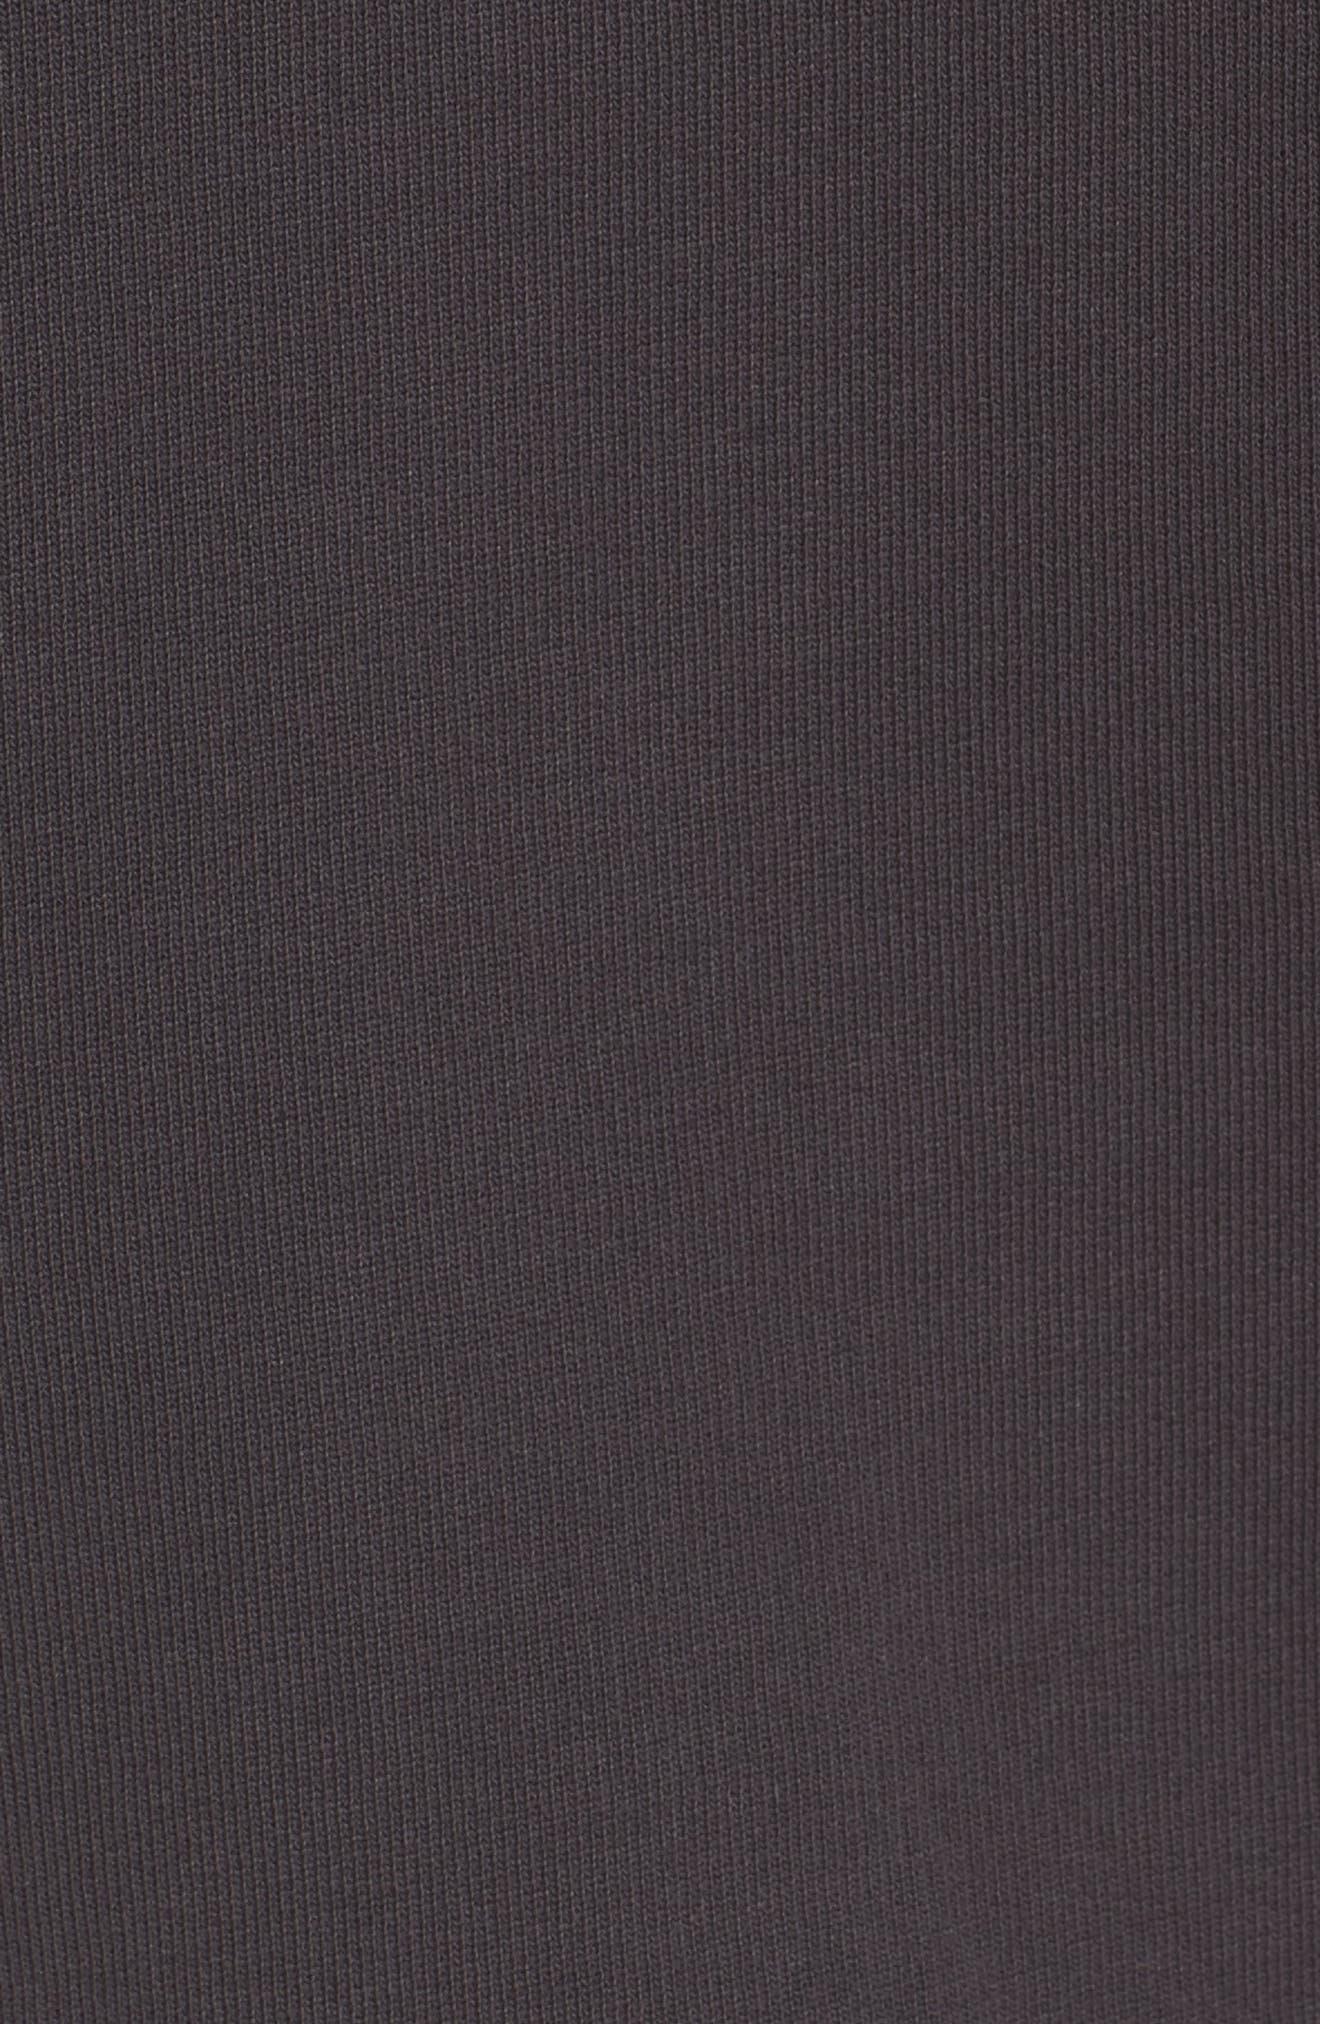 Short Sleeve Pullover Hoodie,                             Alternate thumbnail 6, color,                             020